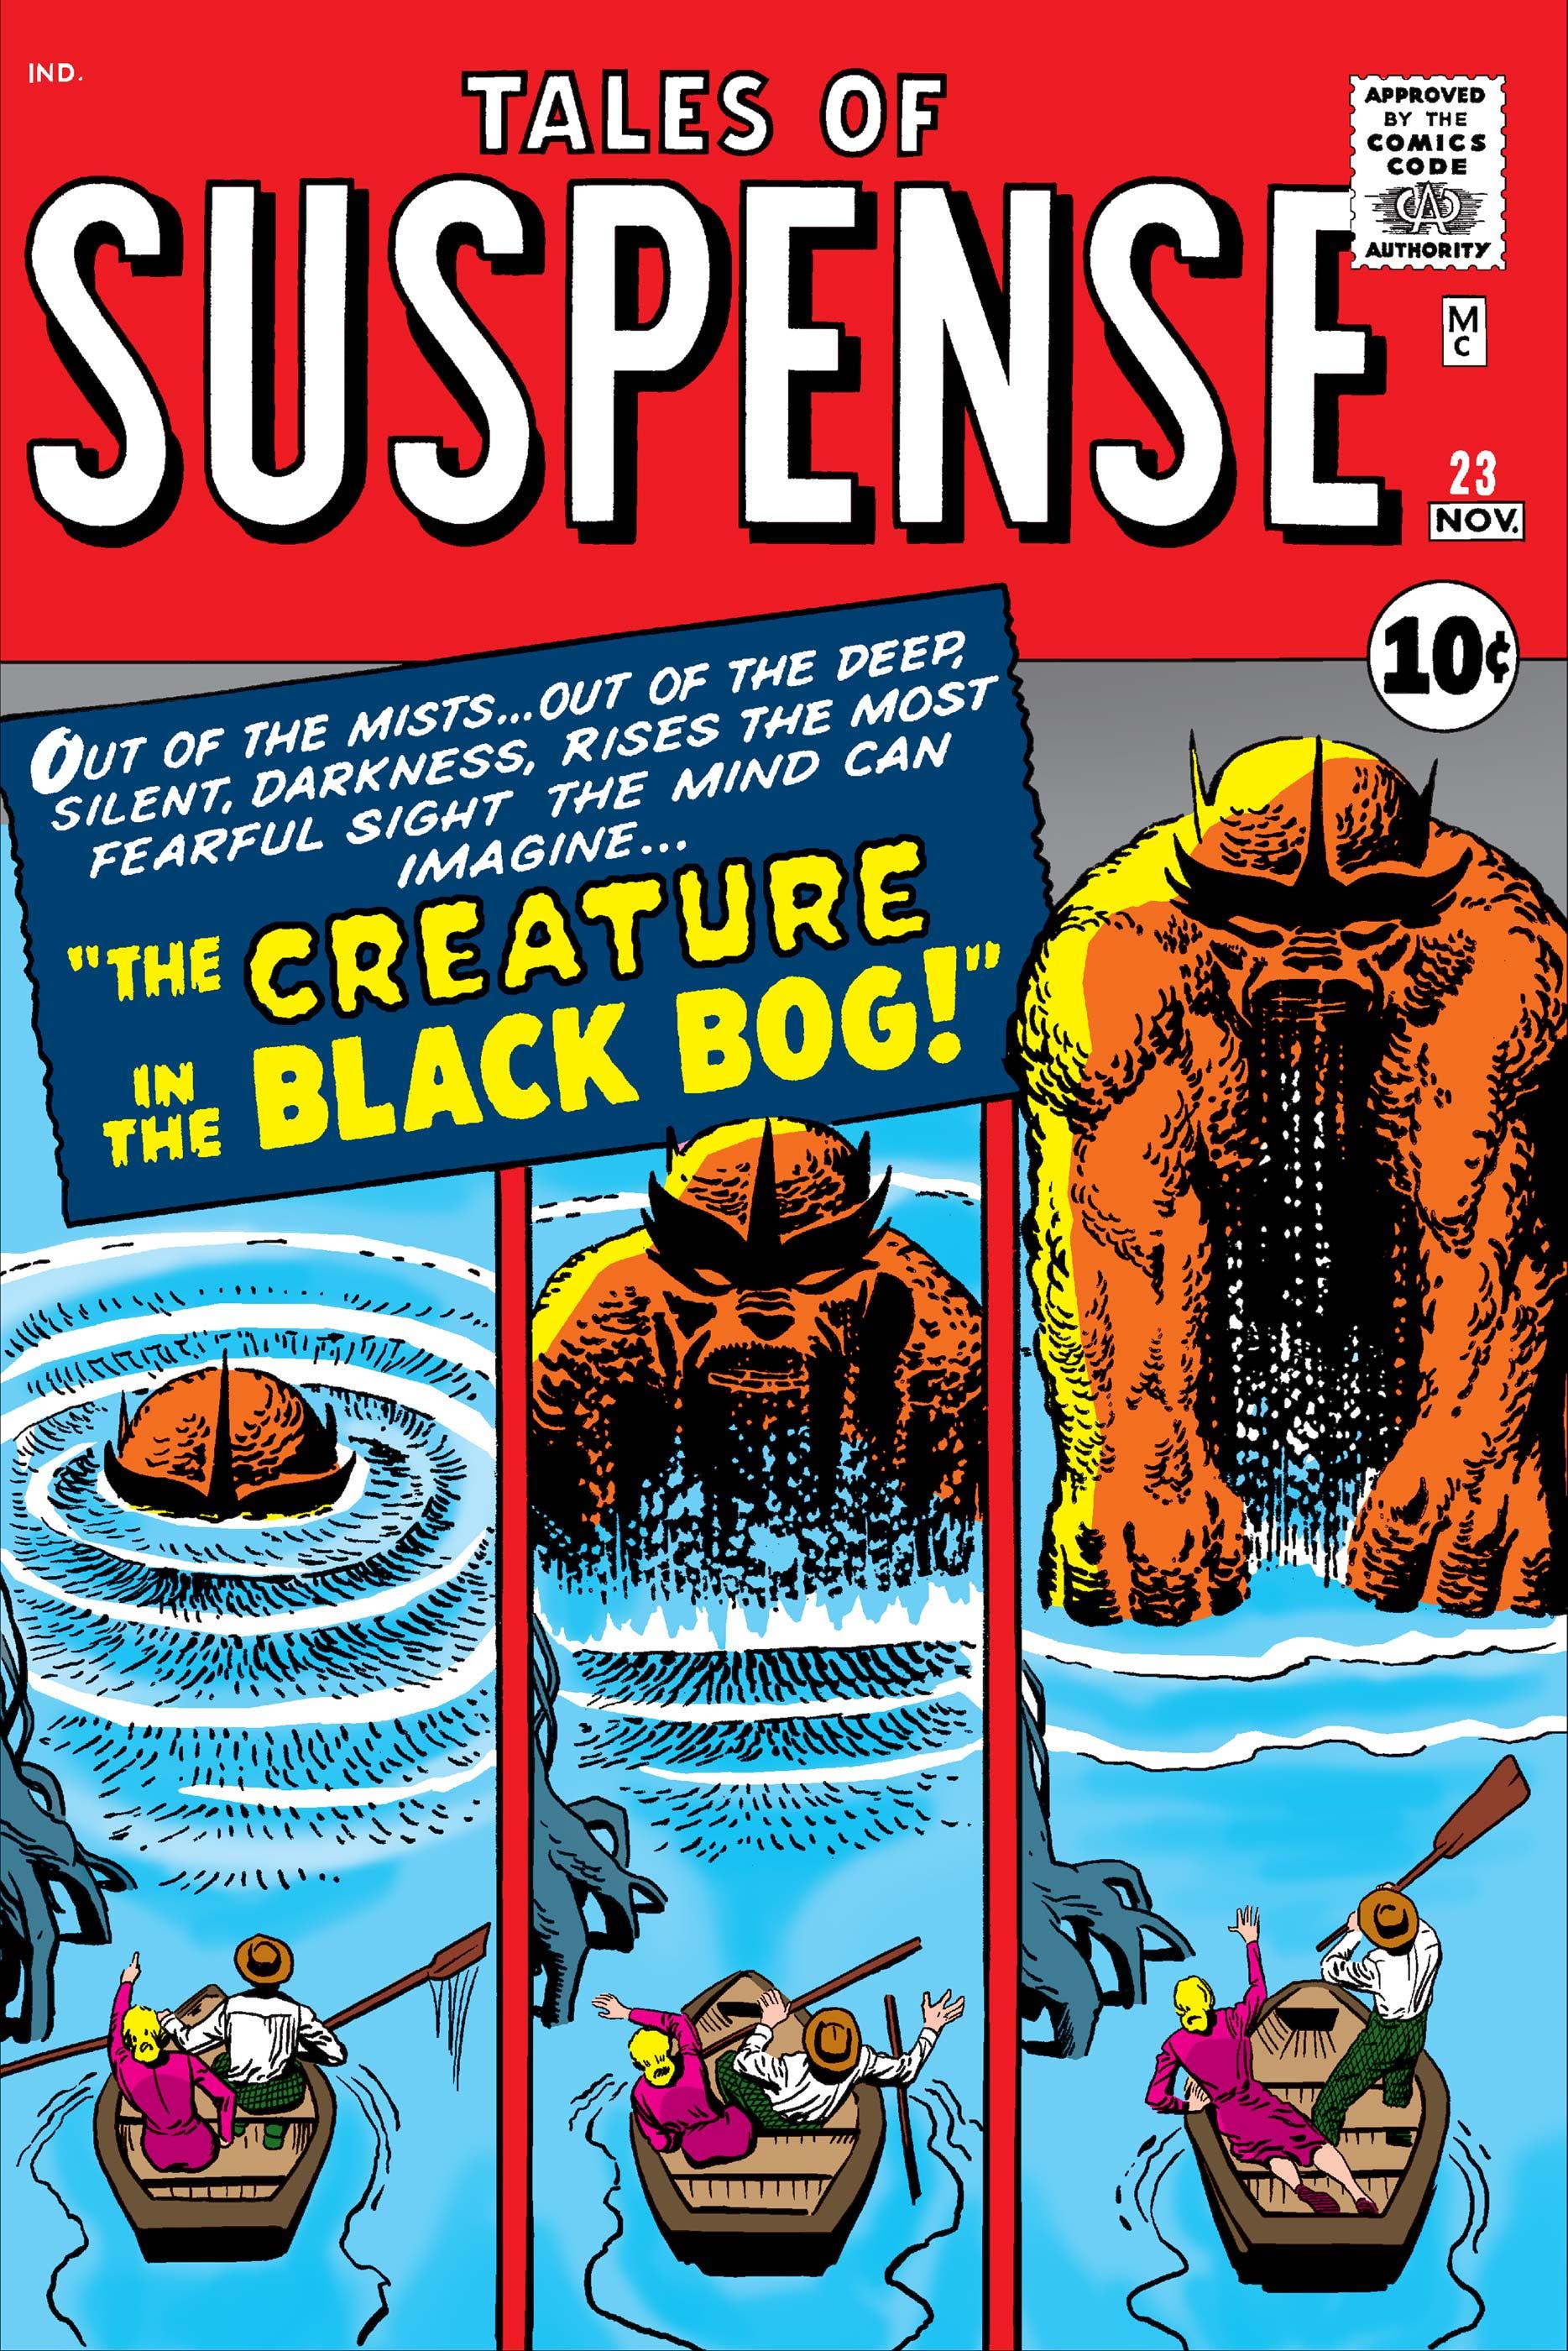 Tales of Suspense (1959) #23